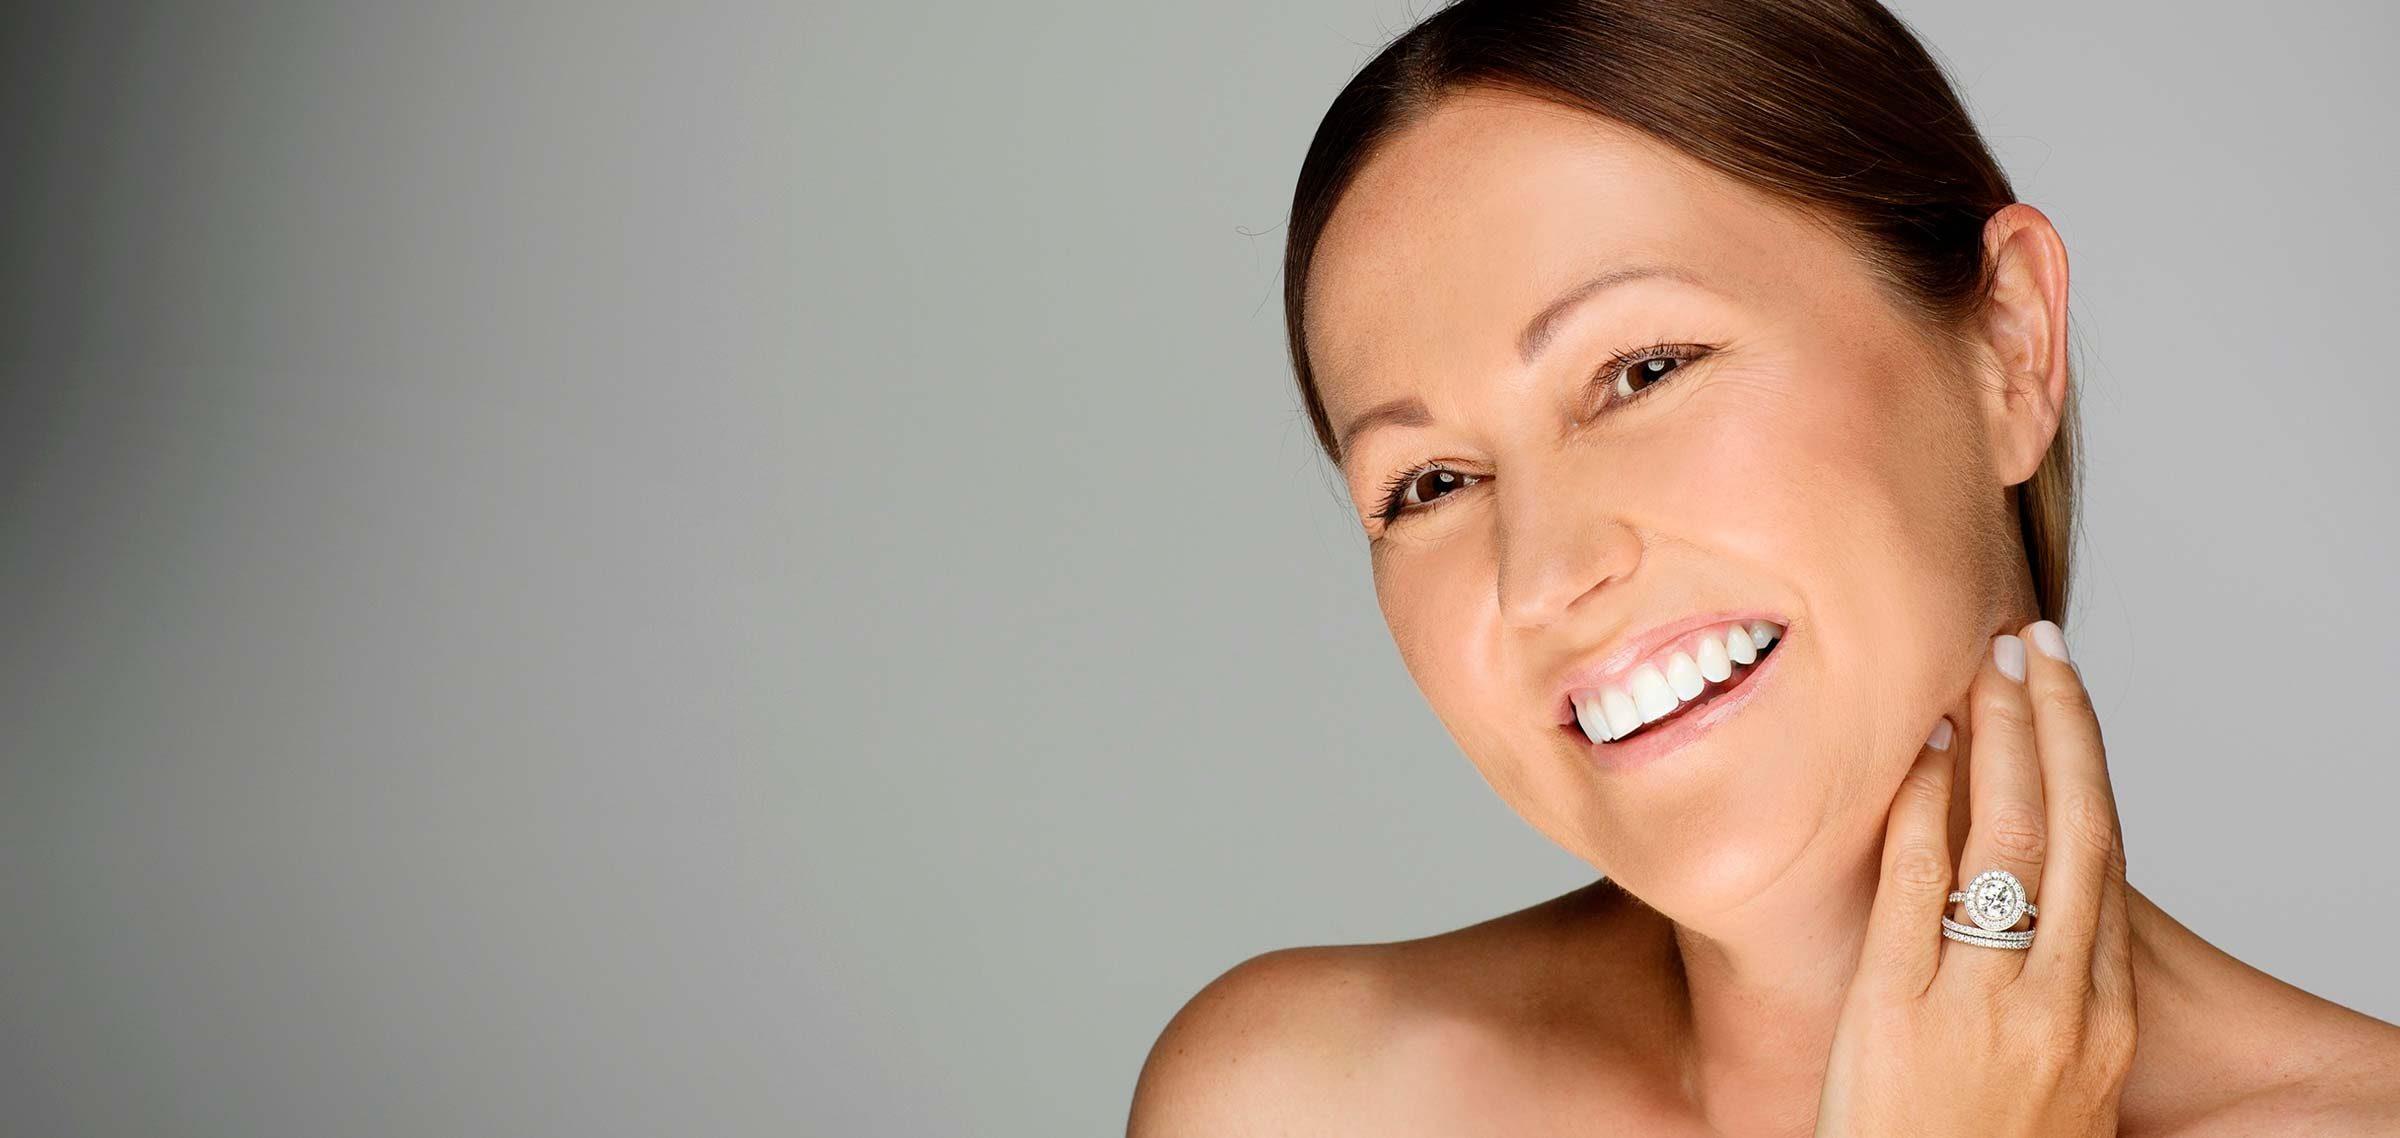 Example of Skin Rejuvenation